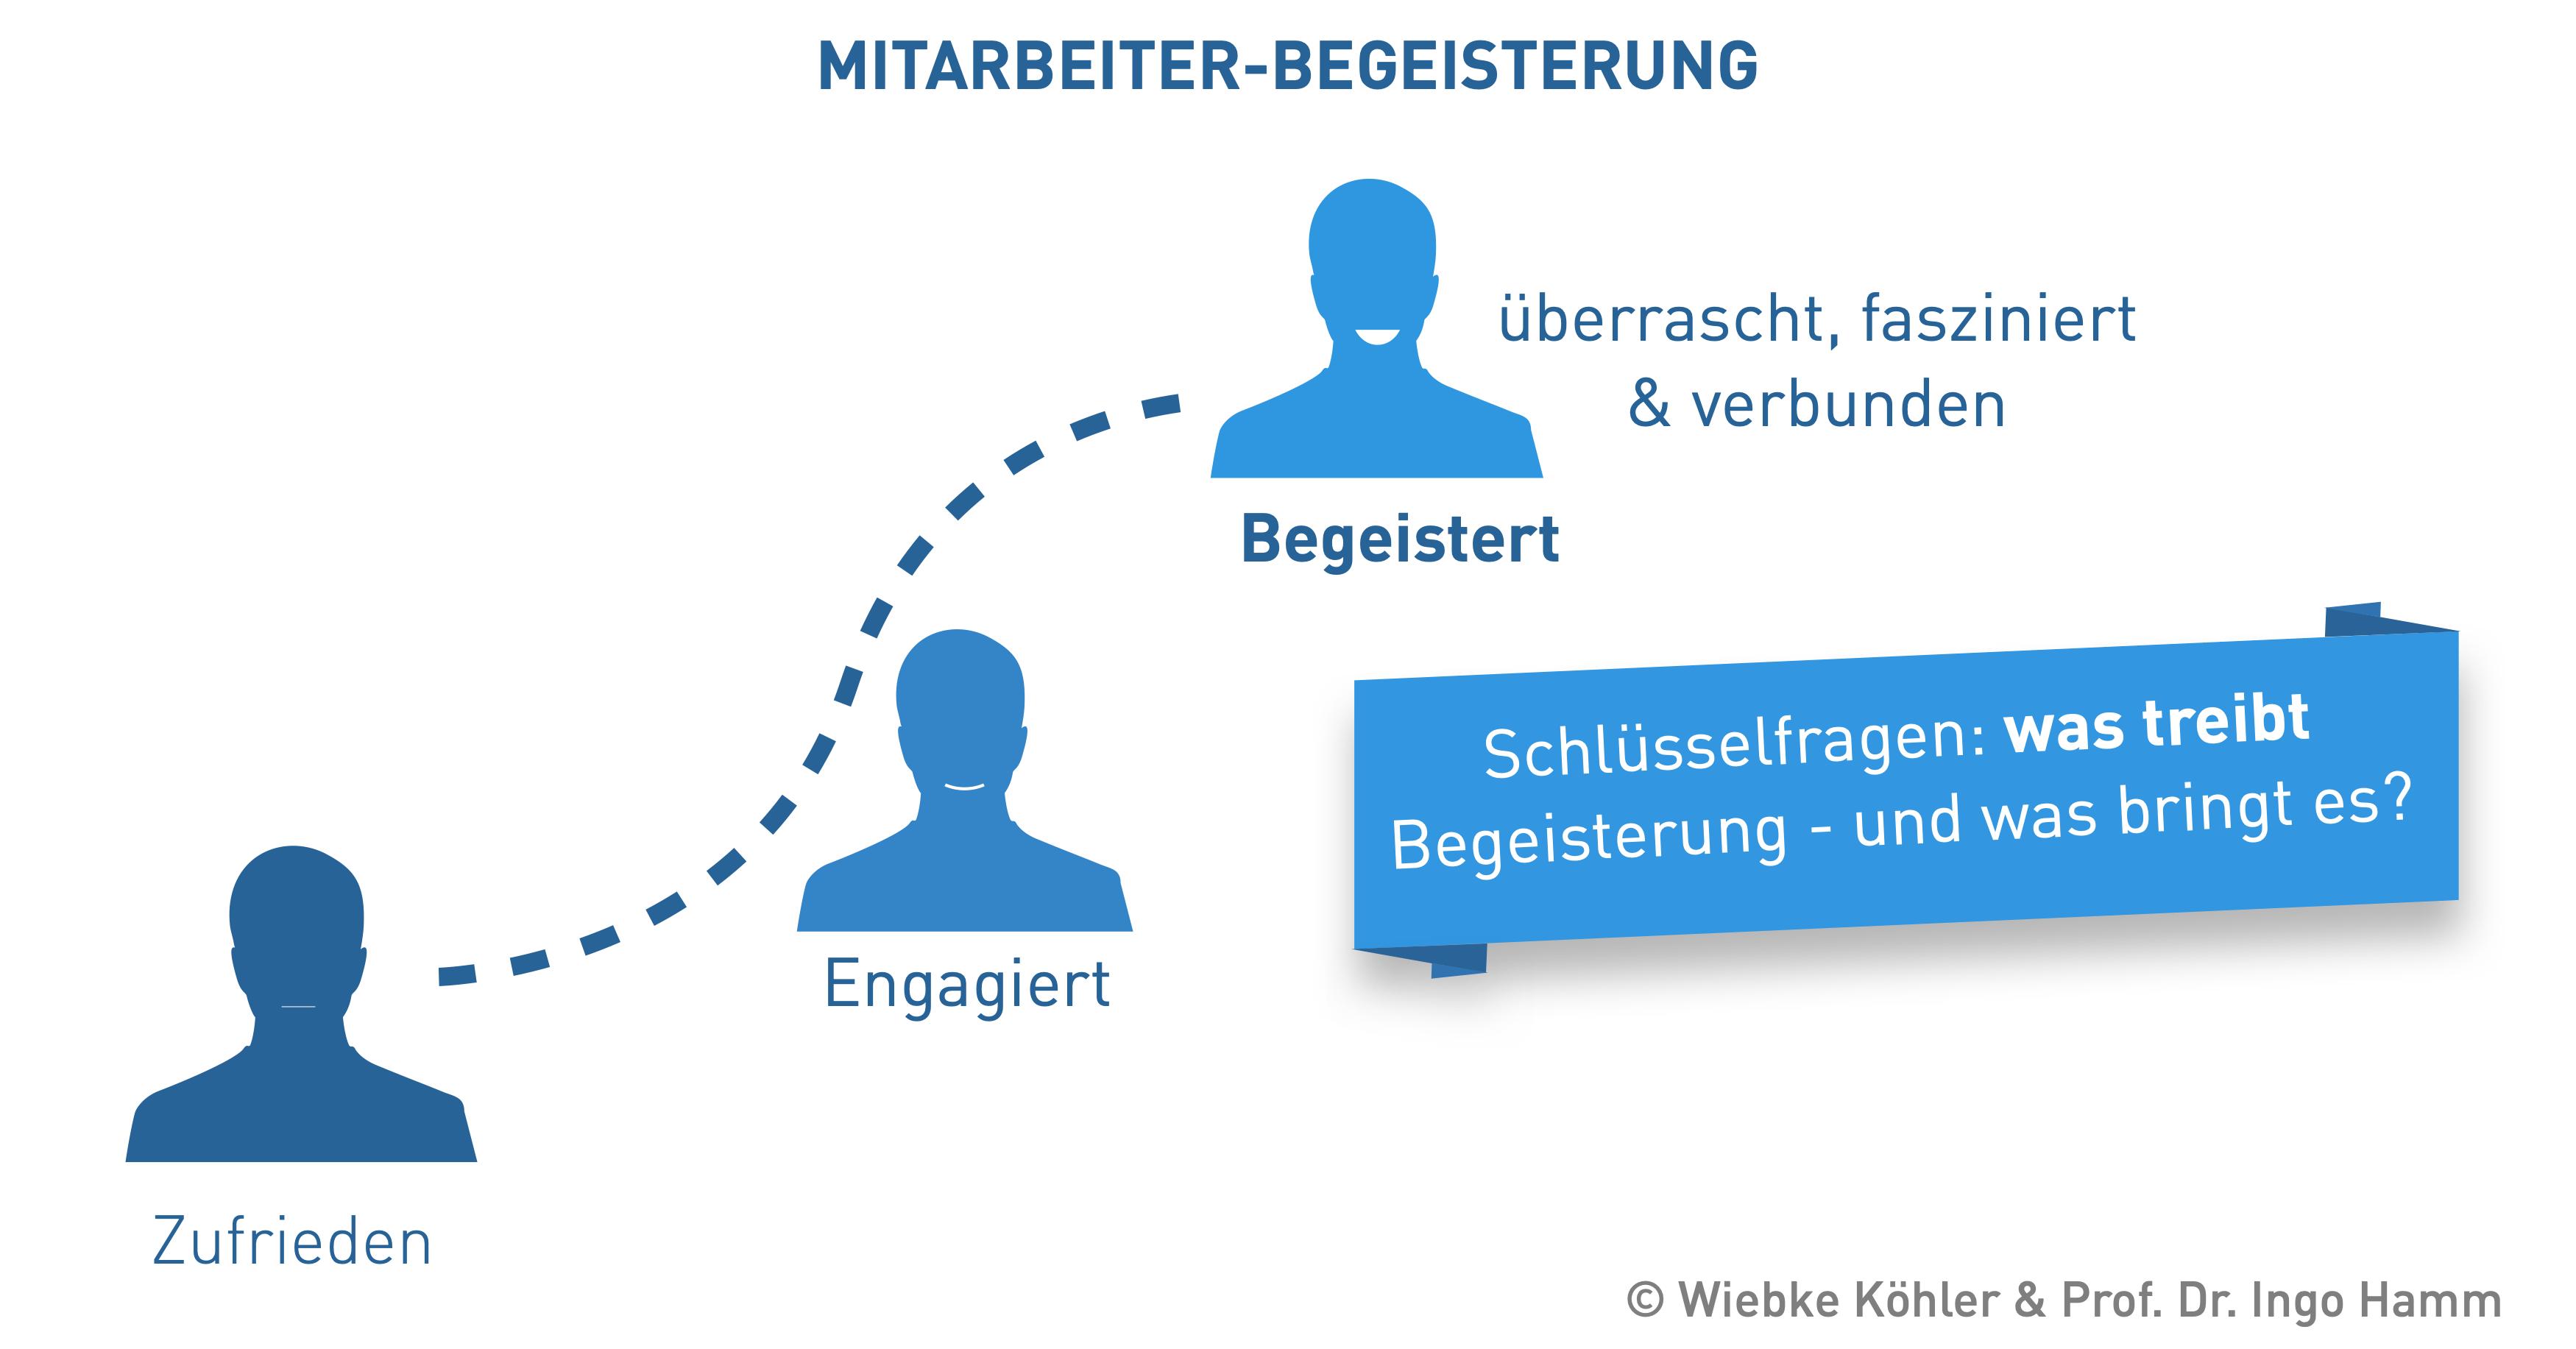 "Forschung - Forschungsprojekt ""Wettbewerbsfaktor Mensch"" - Mitarbeiter-Begeisterung"